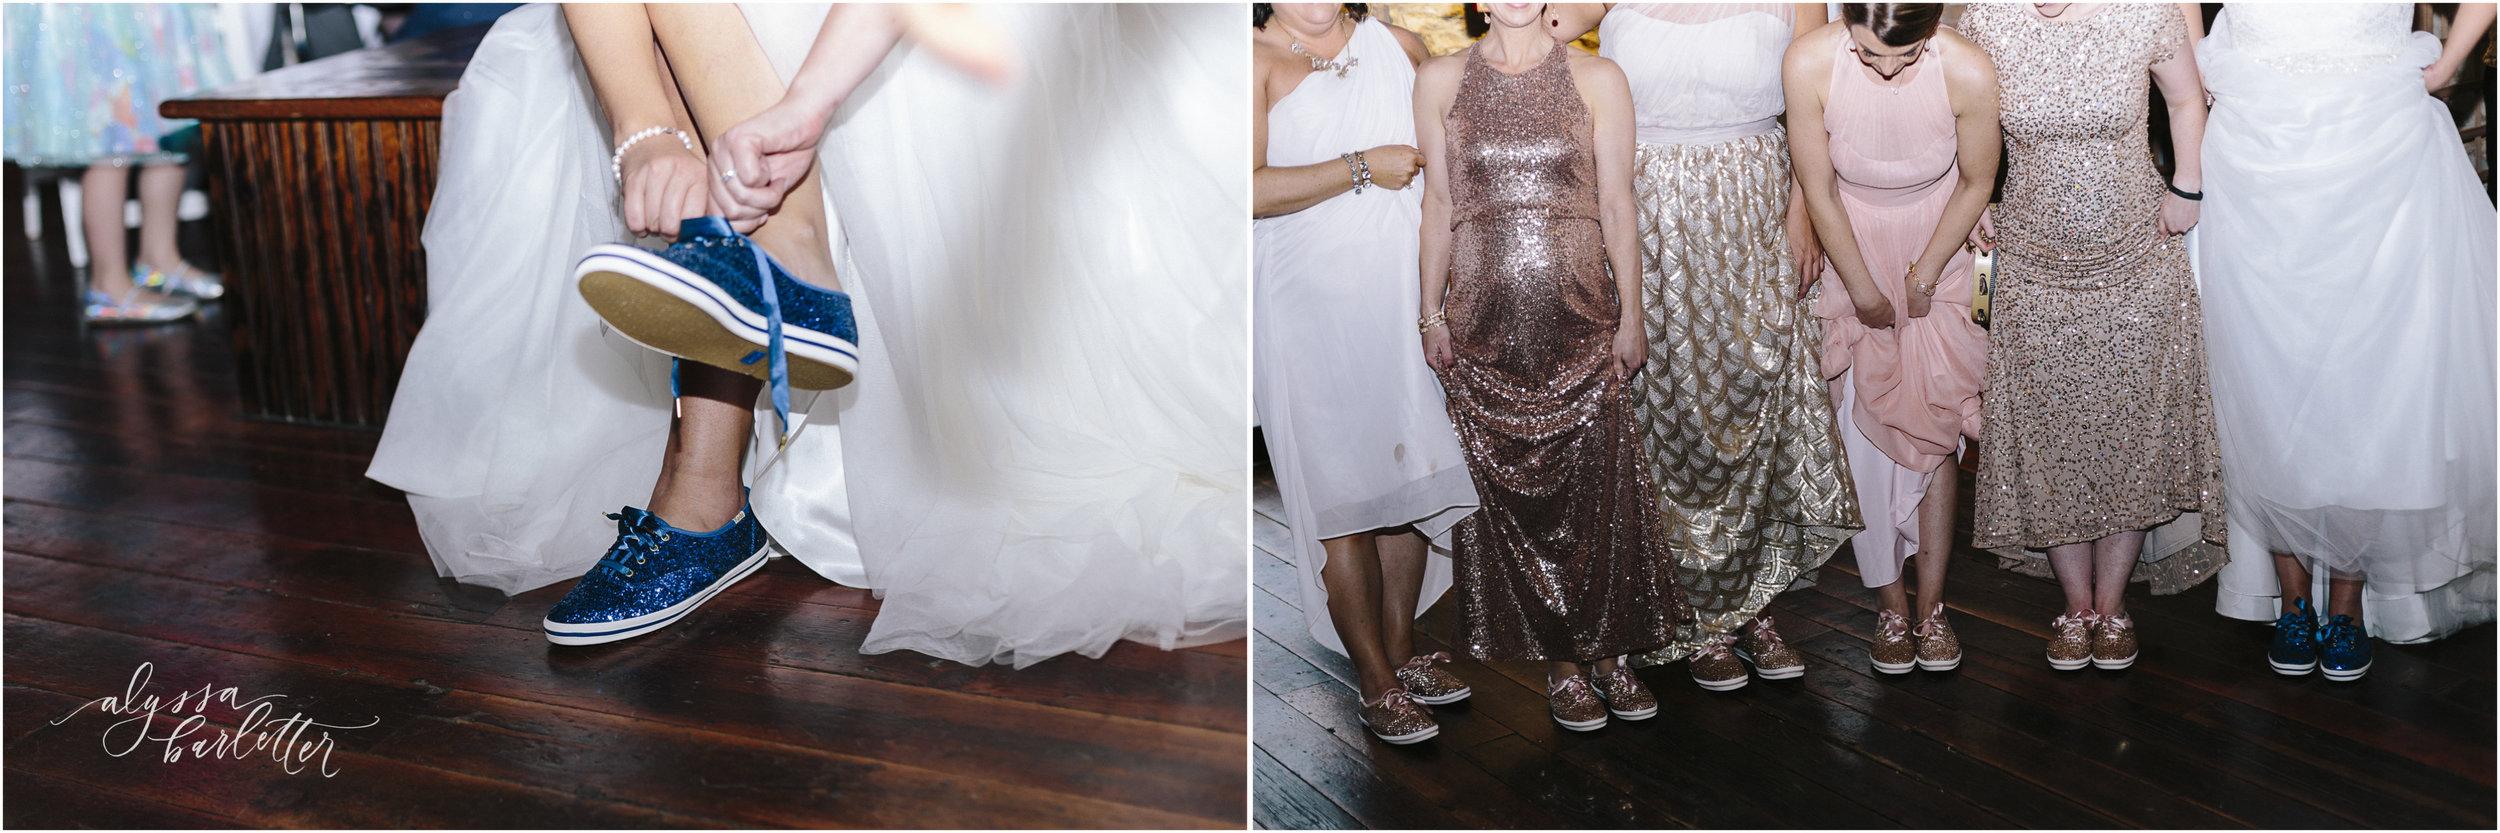 alyssa barletter photography cider gallery lawrence kansas rainy day wedding megan and brett-1-52.jpg